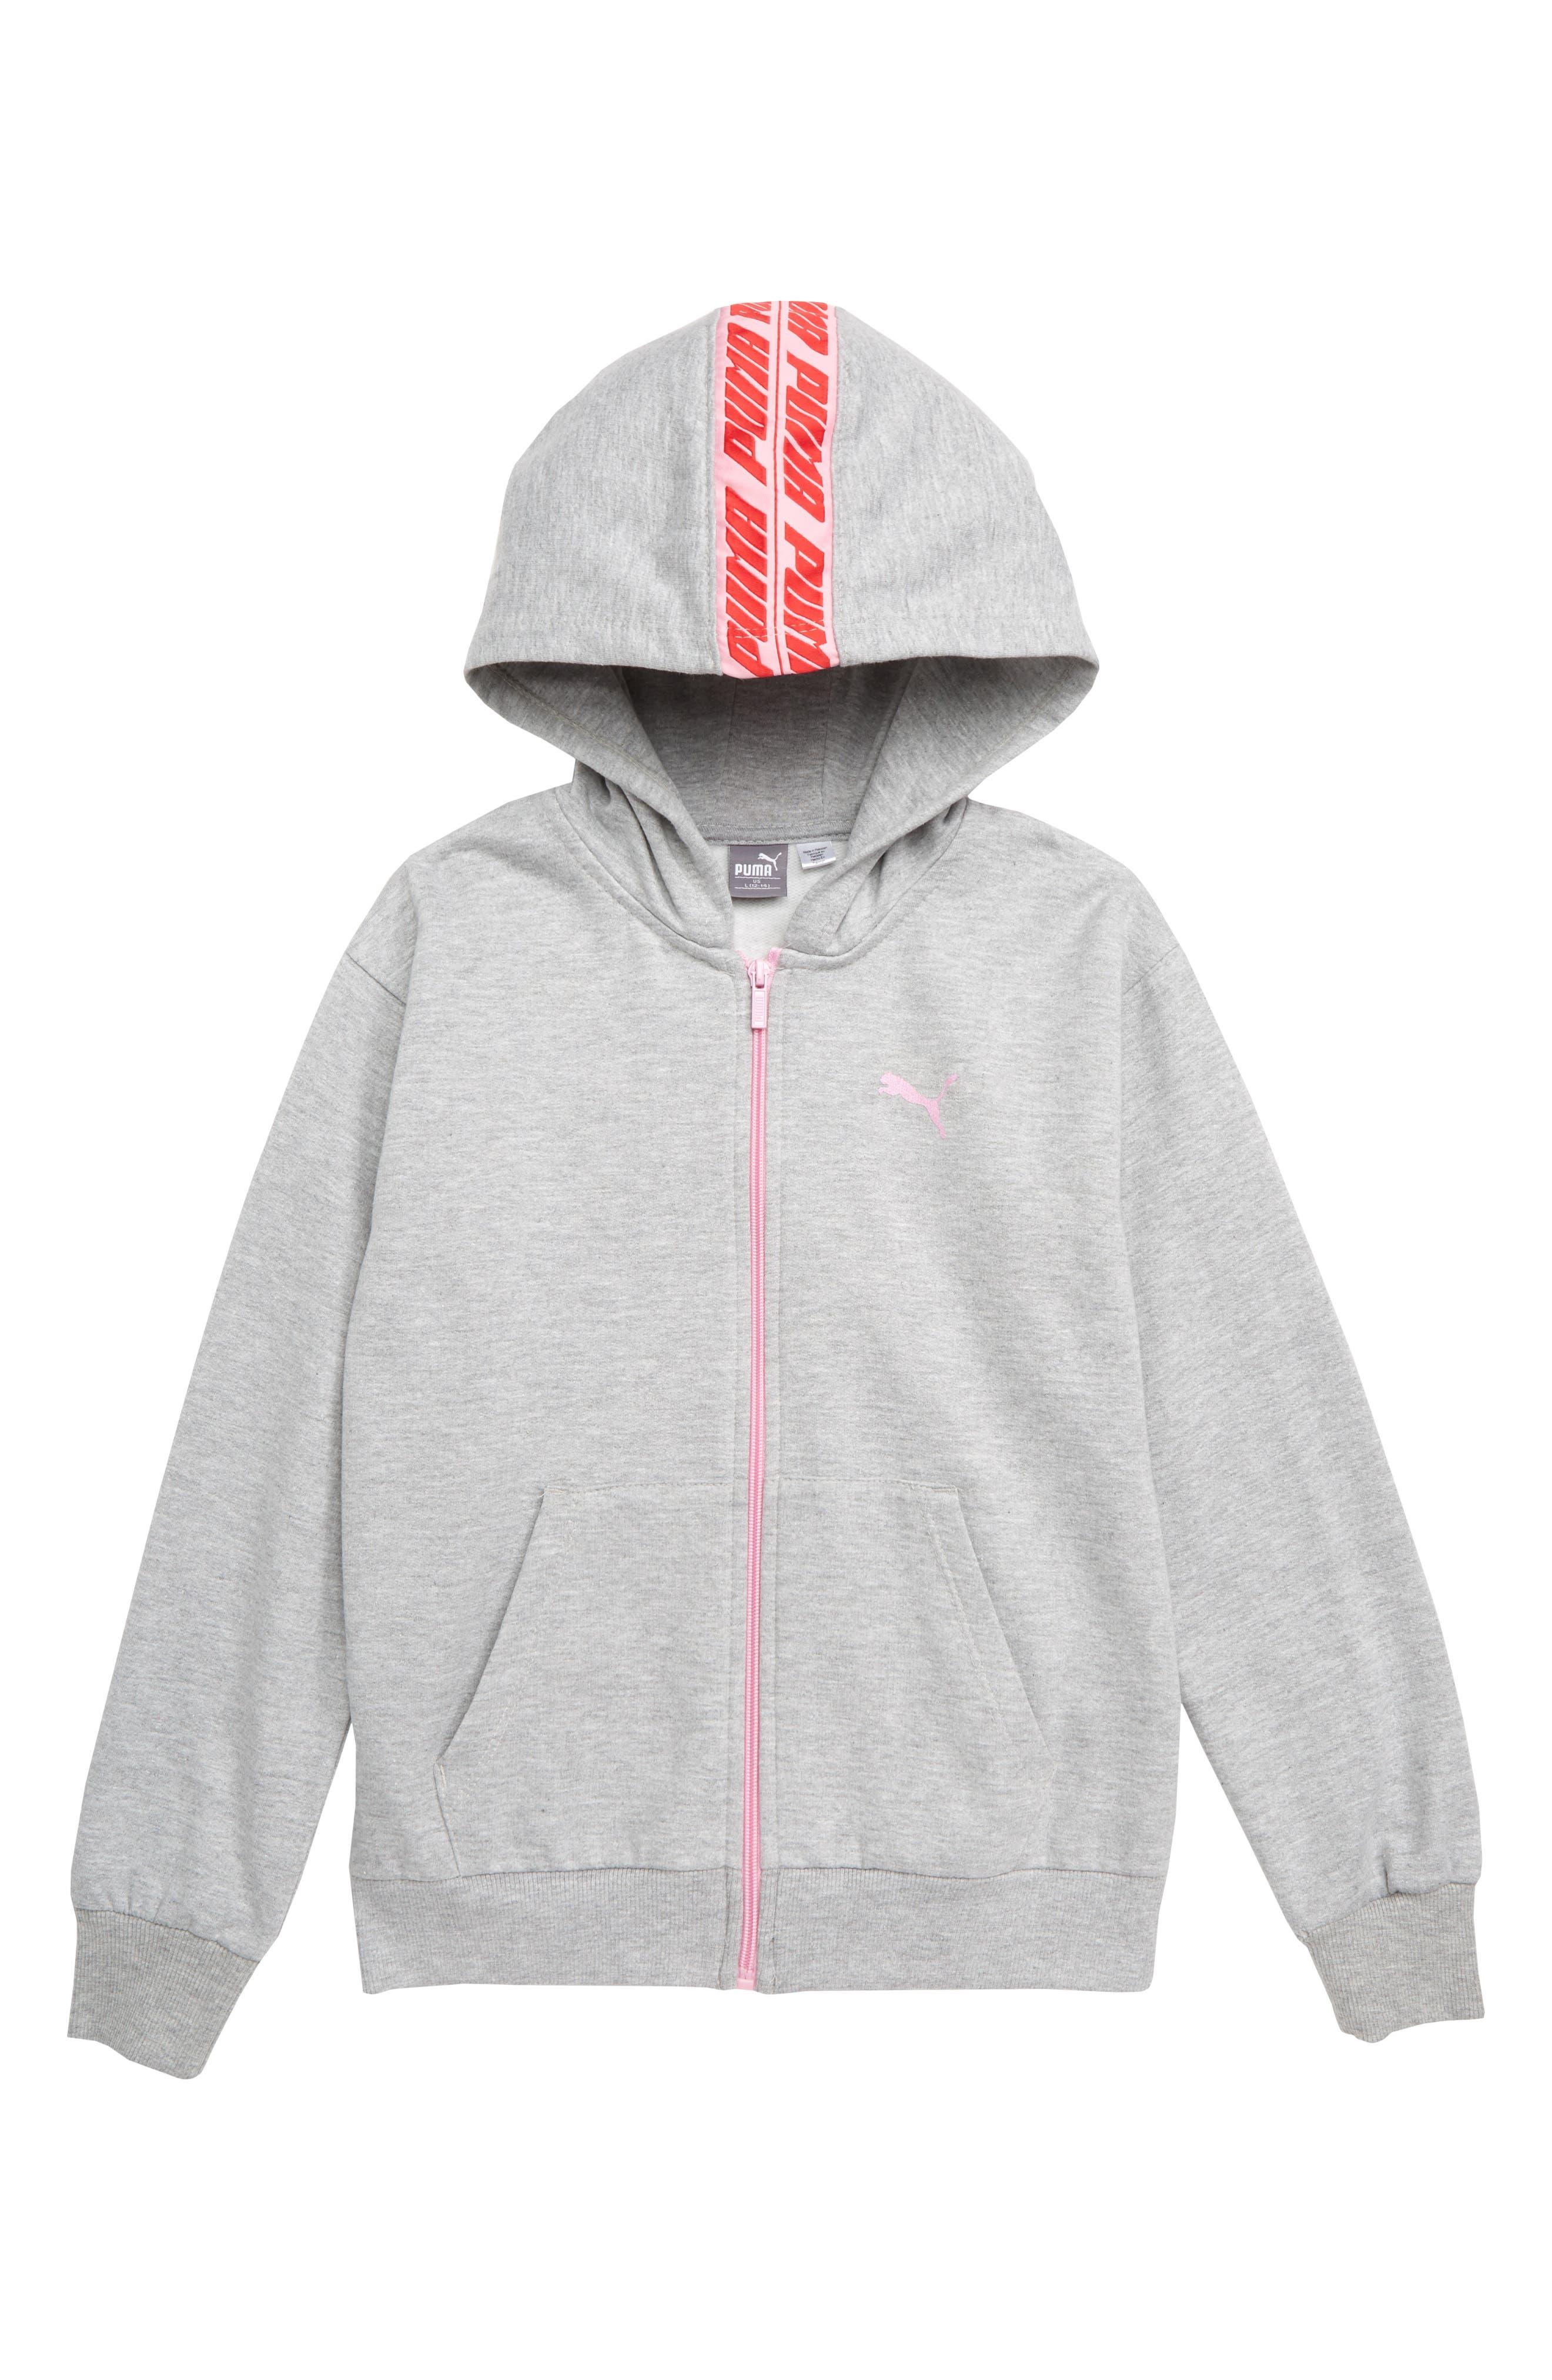 Girls Puma Fleece Zip Hoodie Size XL (14)  Grey